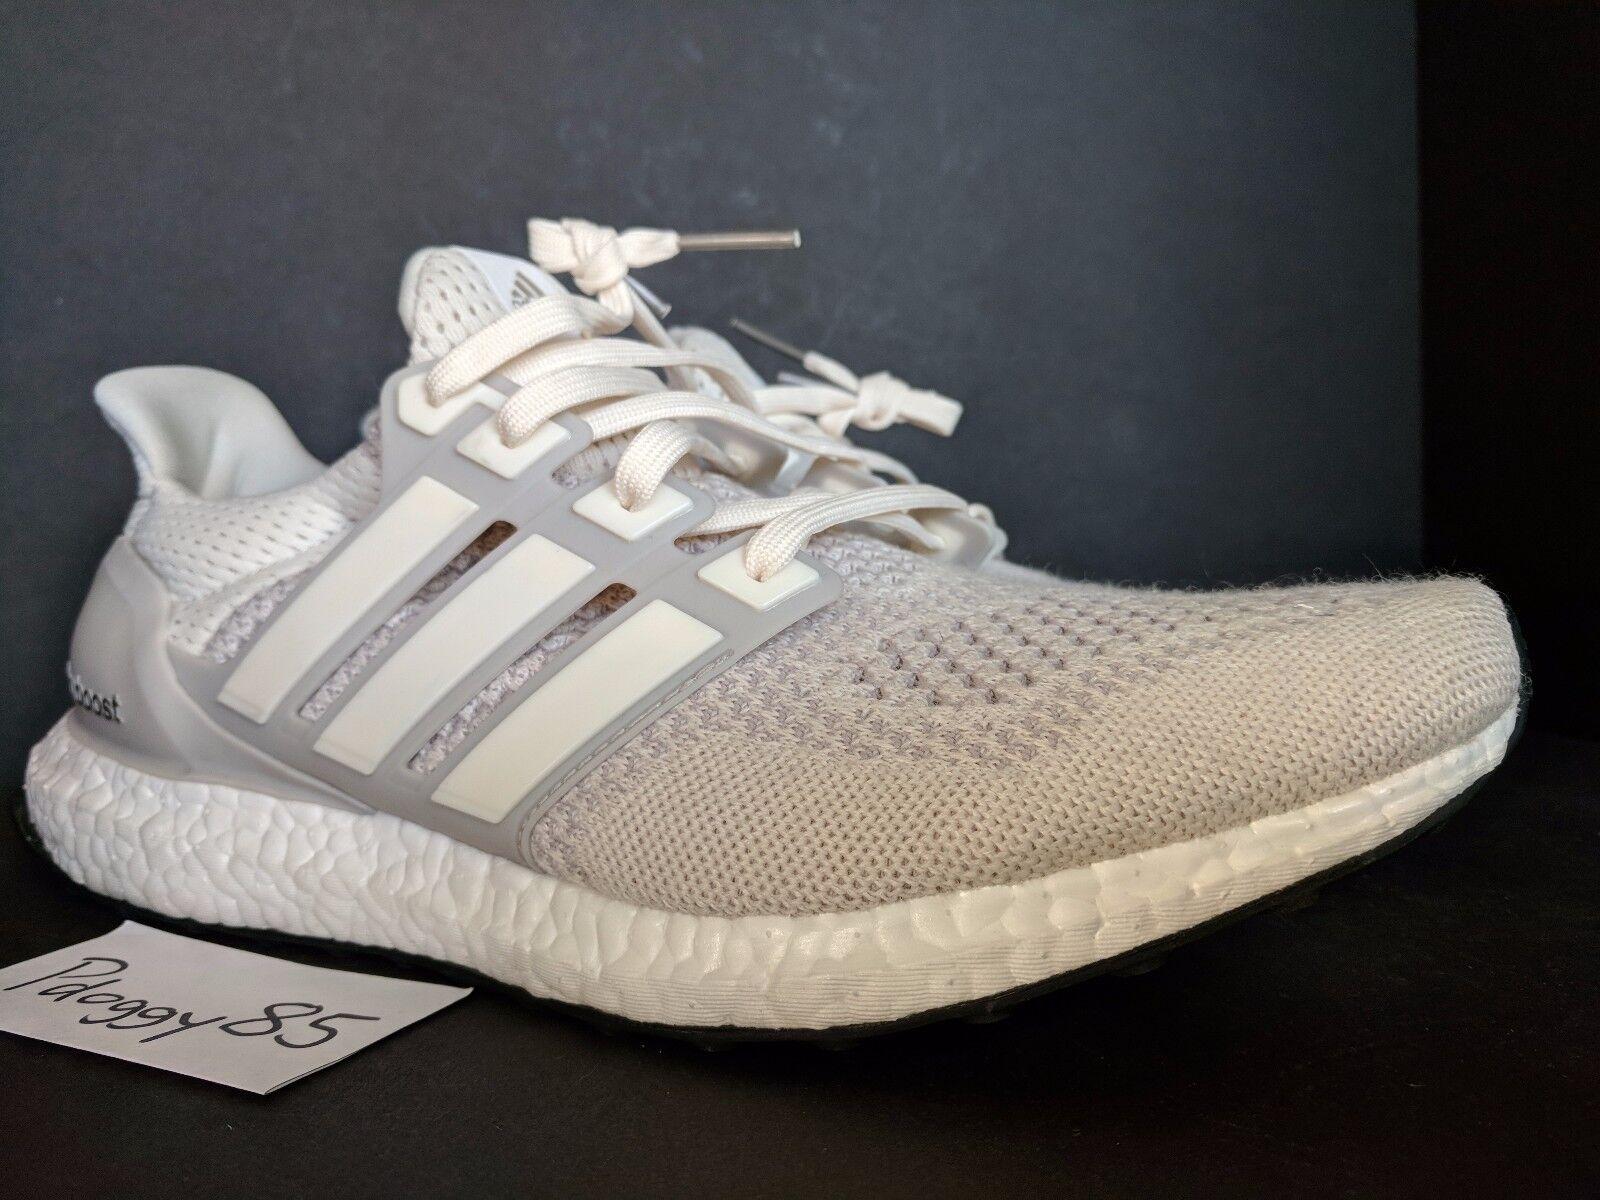 VVVNDS Adidas Ultra Boost 1.0 Size 11 Cream Chalk NMD SNS Hypebeast Kith Yeezy